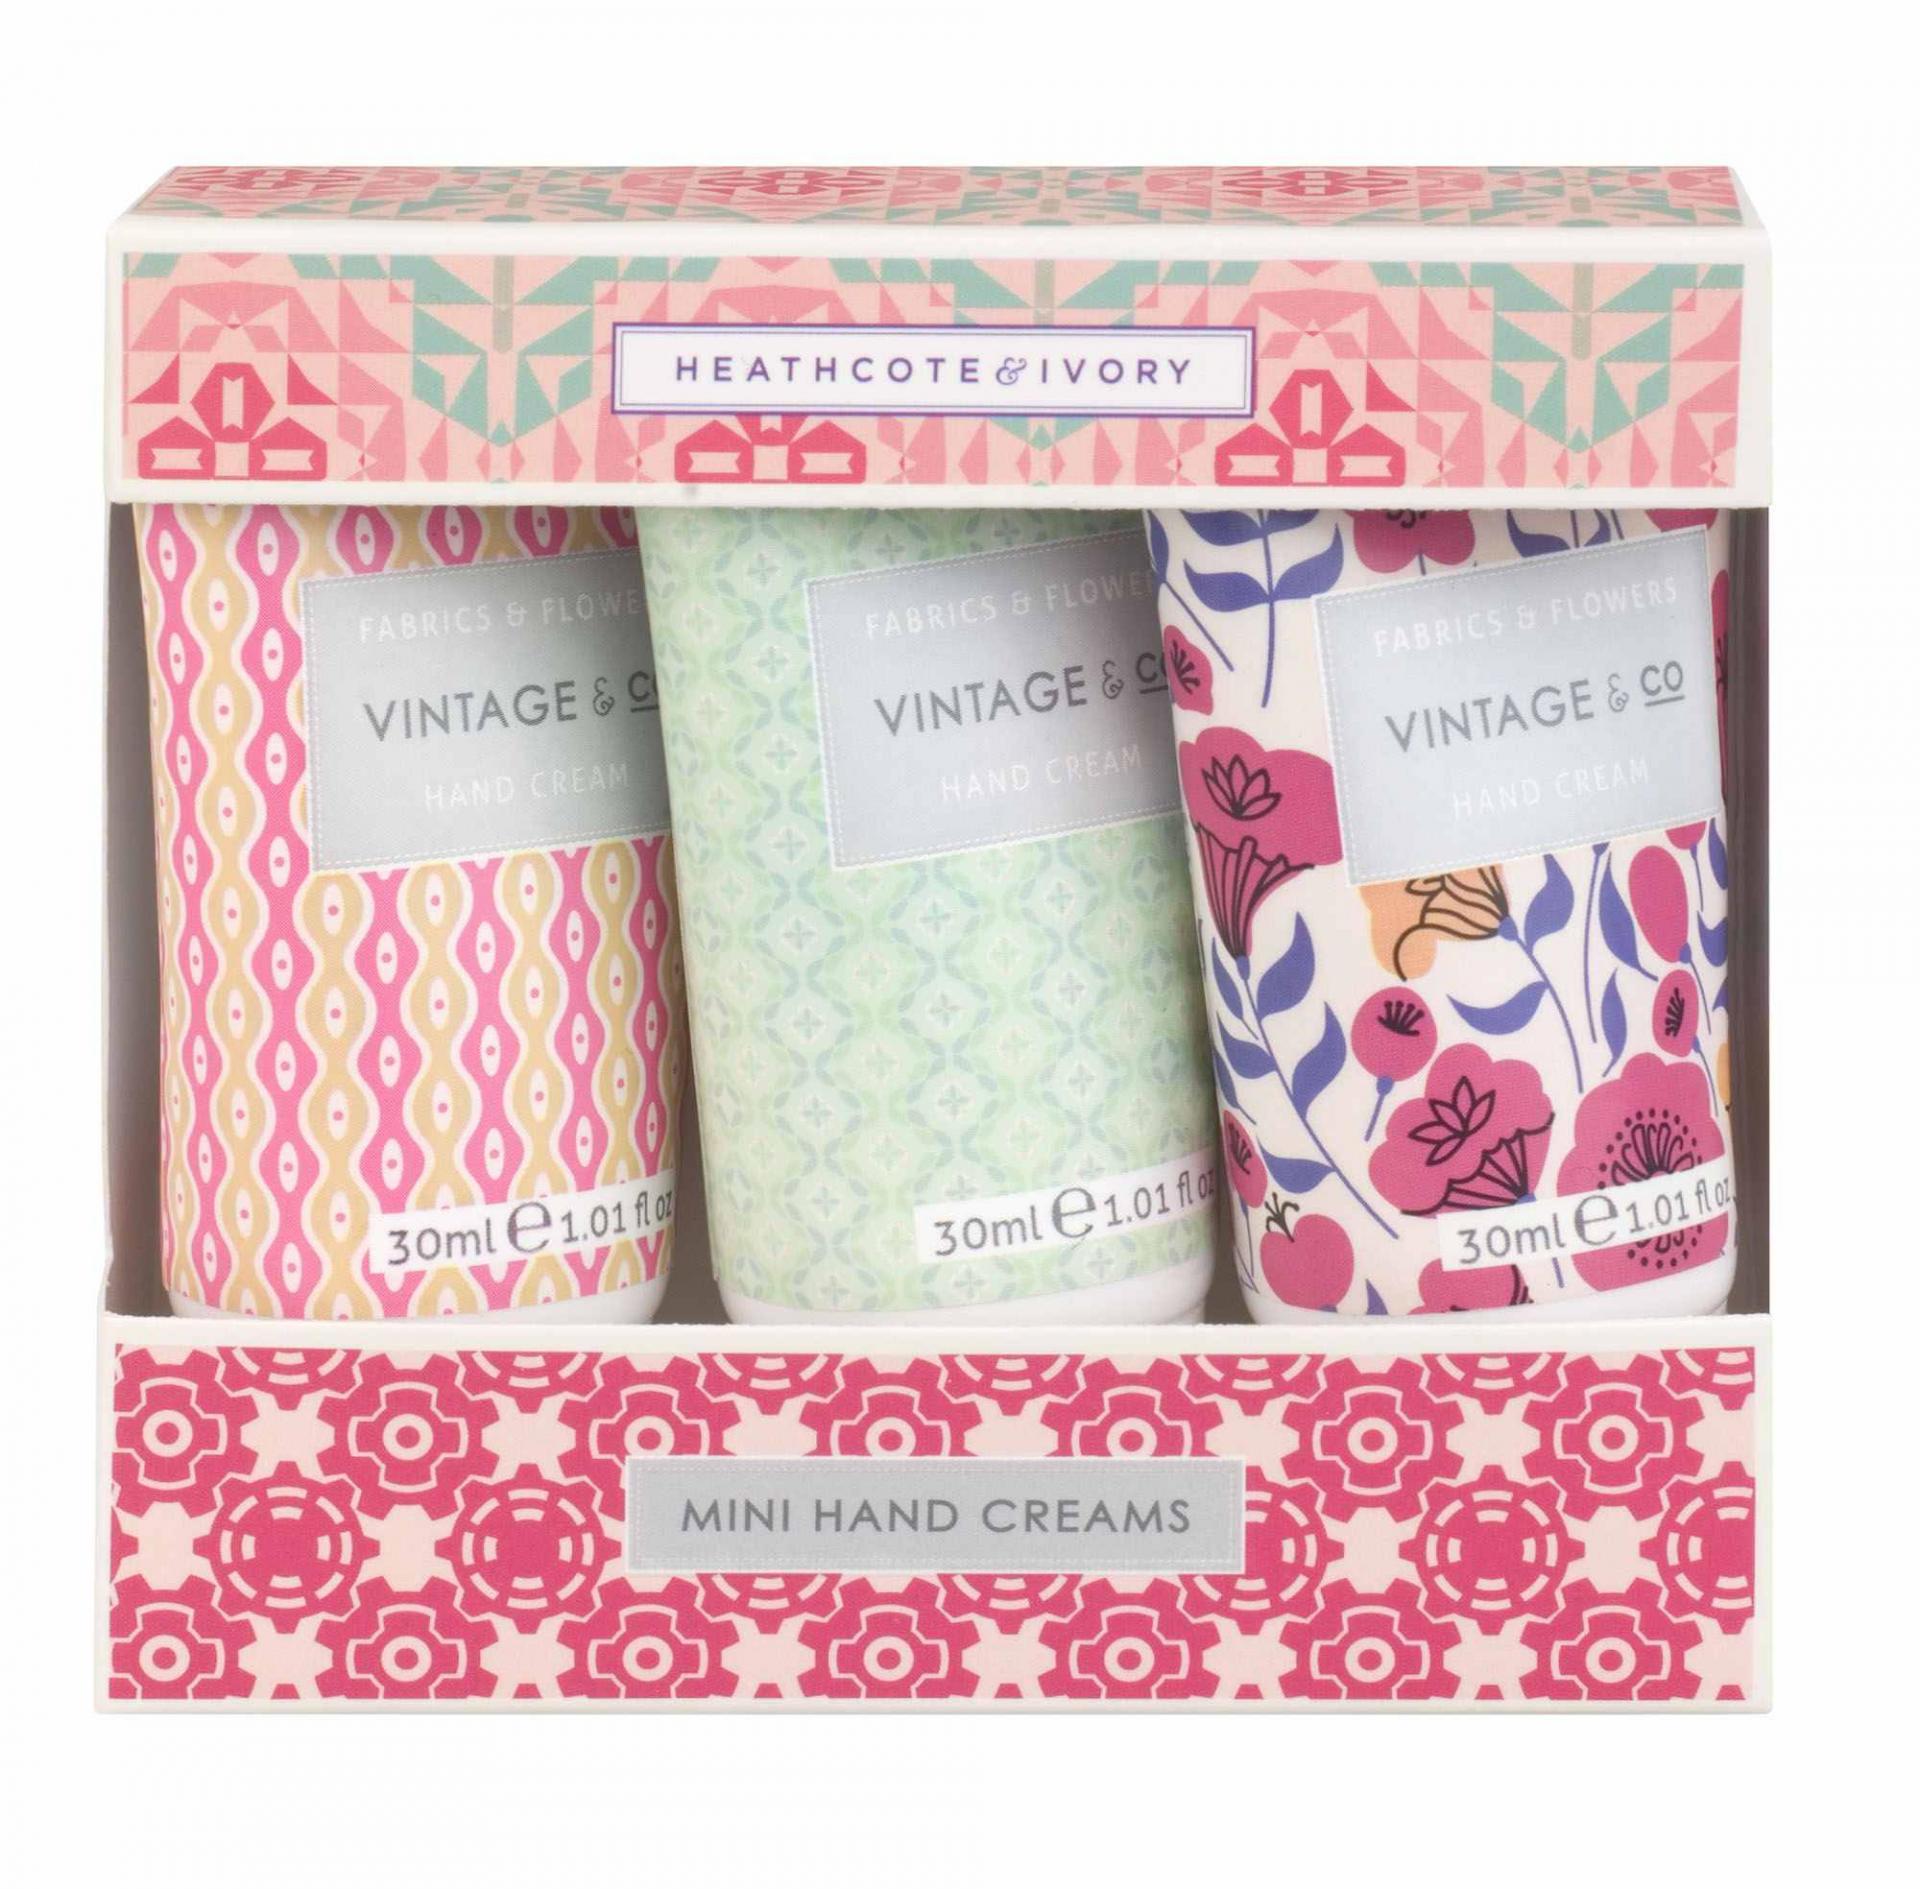 HEATHCOTE & IVORY Dárková sada mini krémů na ruce Fabrics & Flowers, růžová barva, zelená barva, multi barva, plast